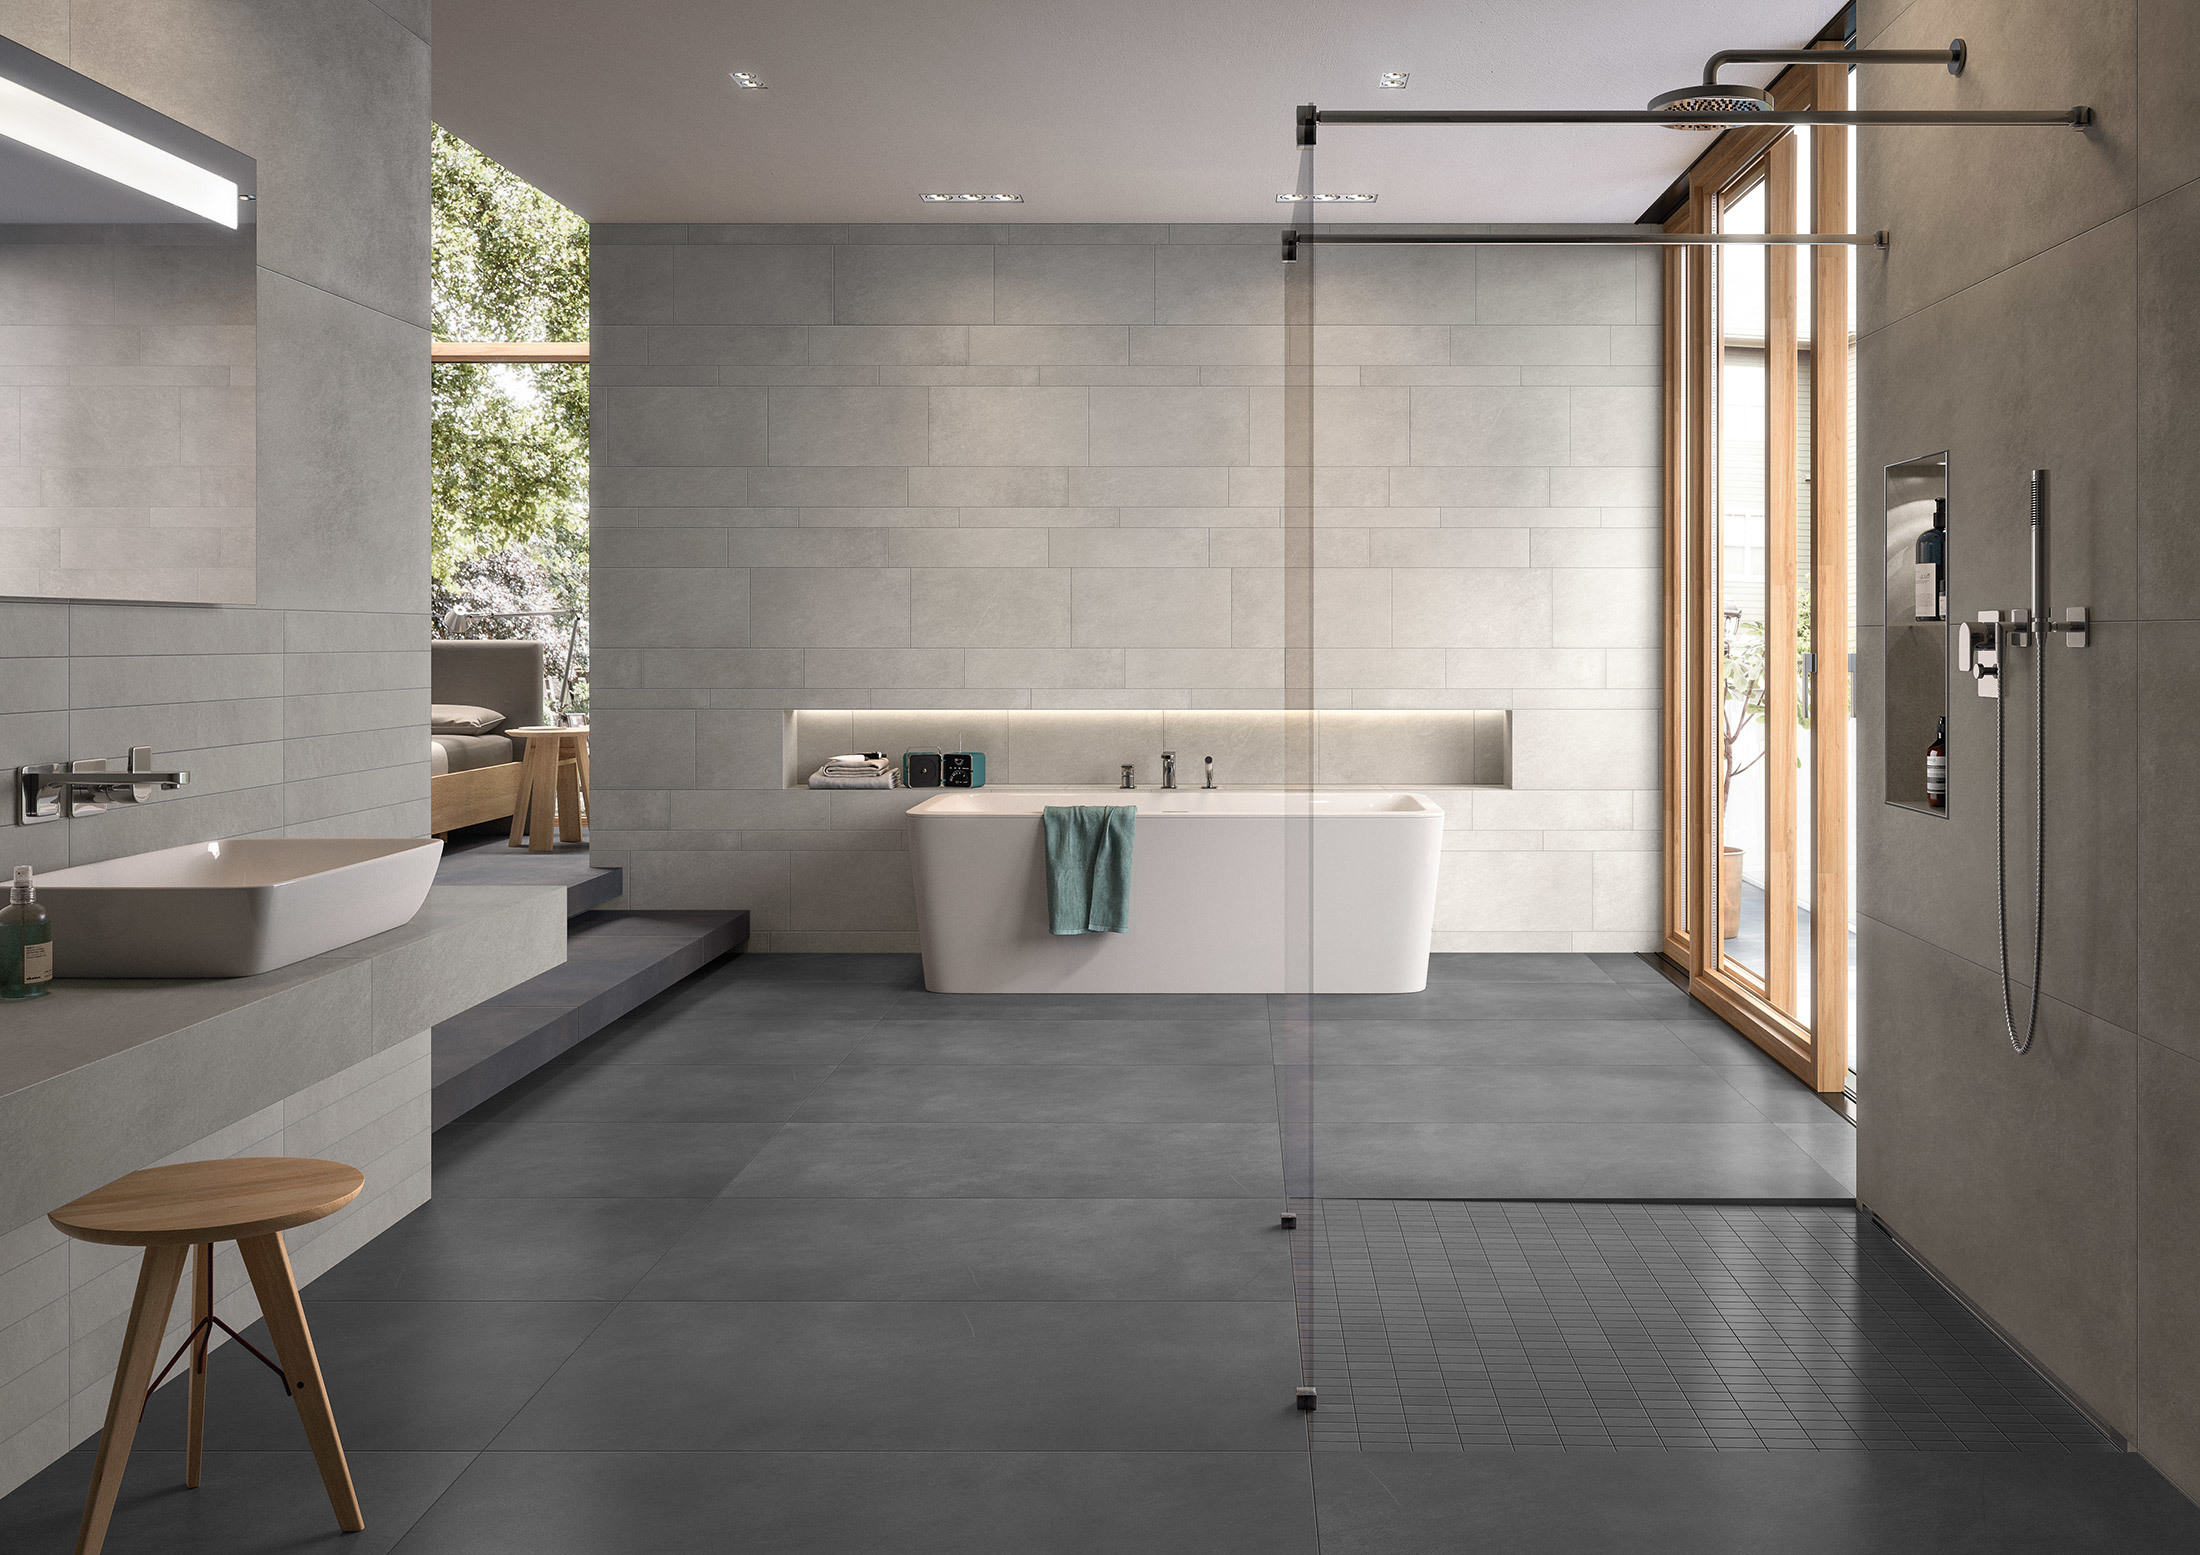 bernina von villeroy boch fliesen stylepark. Black Bedroom Furniture Sets. Home Design Ideas